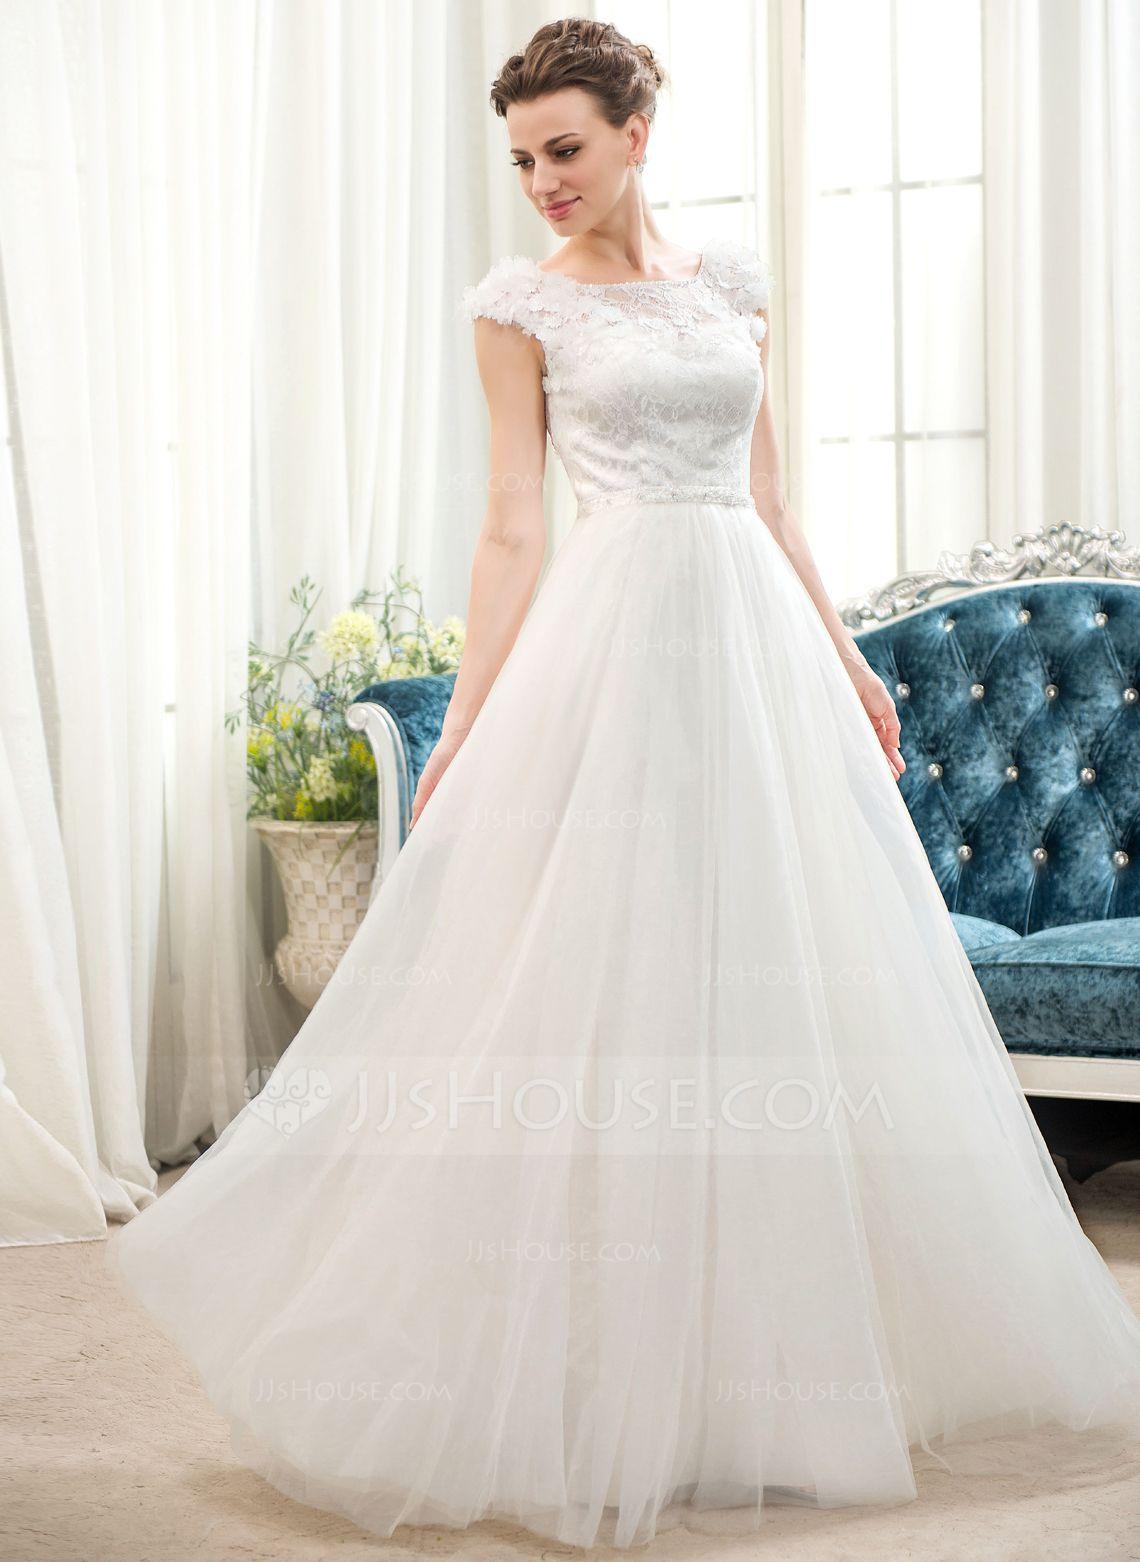 Plus size beach wedding guest dresses  ALinePrincess Scoop Neck FloorLength Tulle Charmeuse Lace Wedding